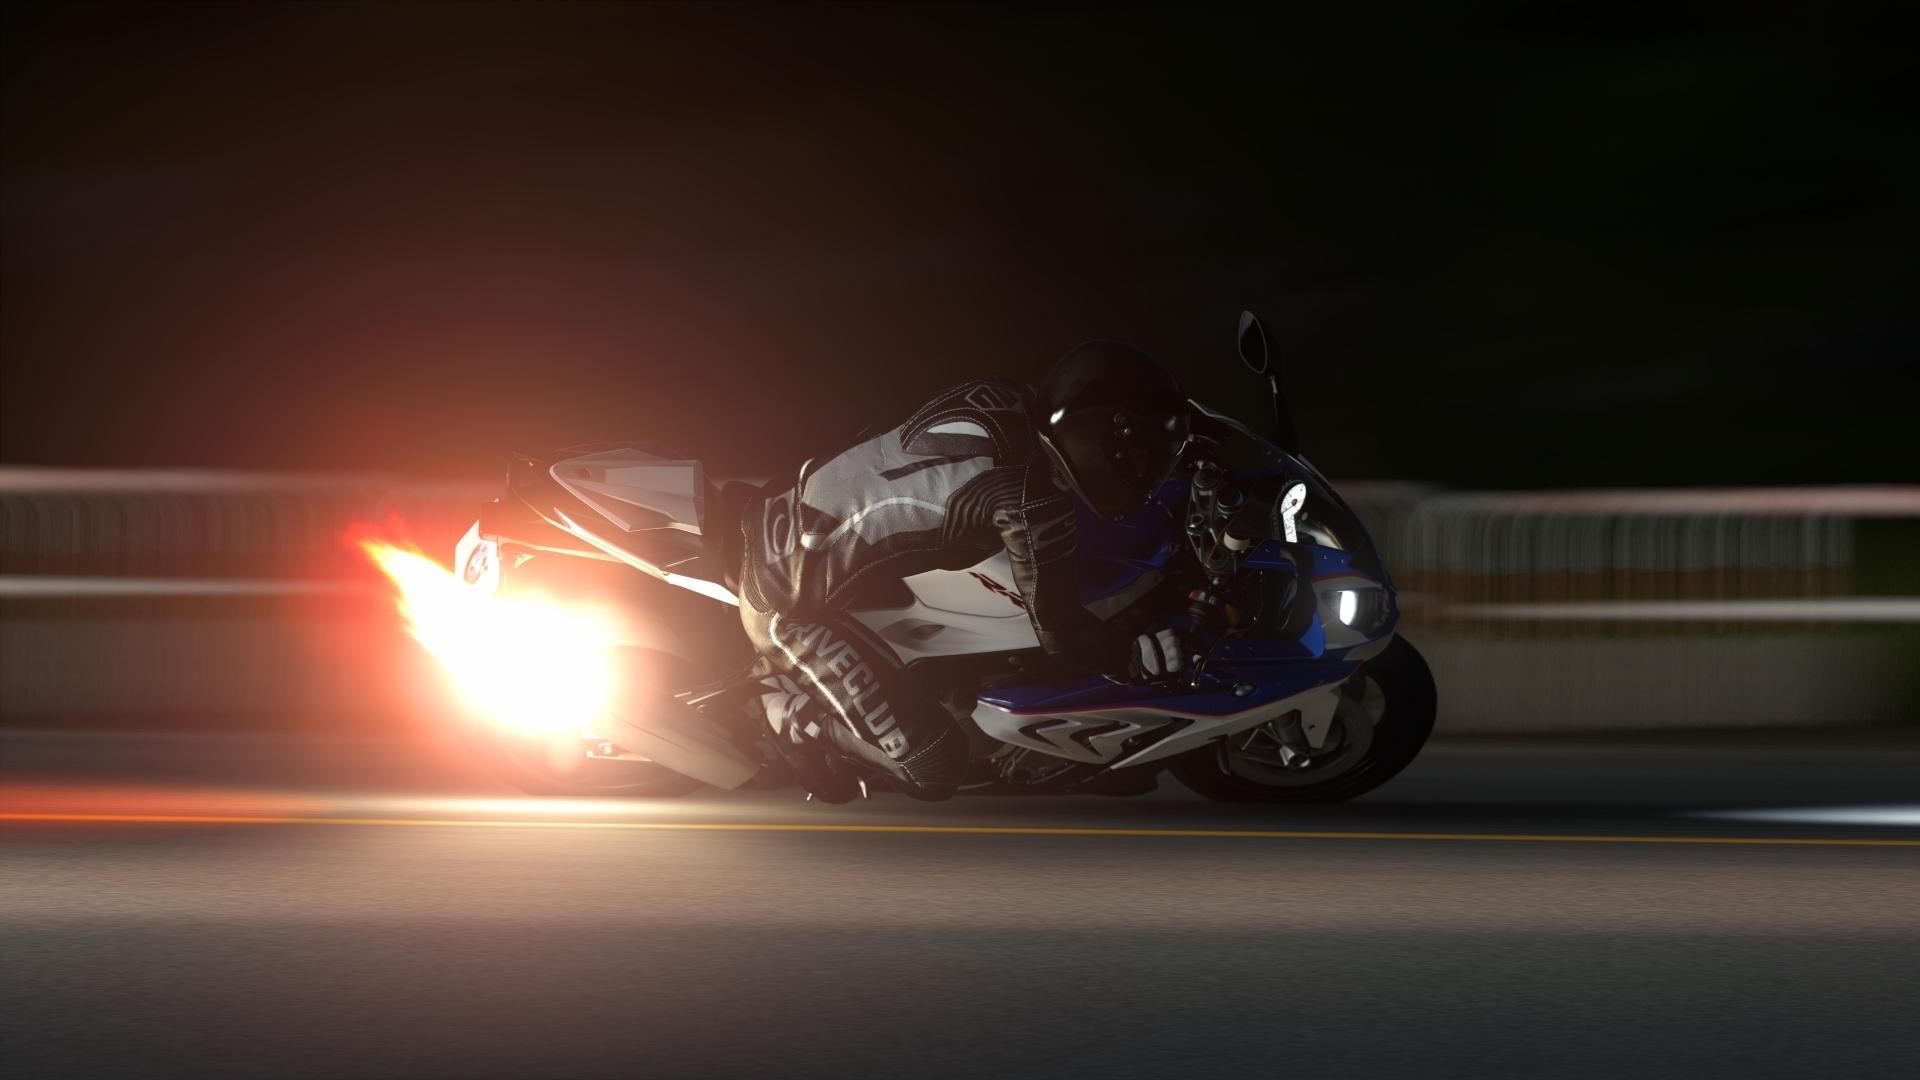 driveclub-bikes-107427-2224477.jpg